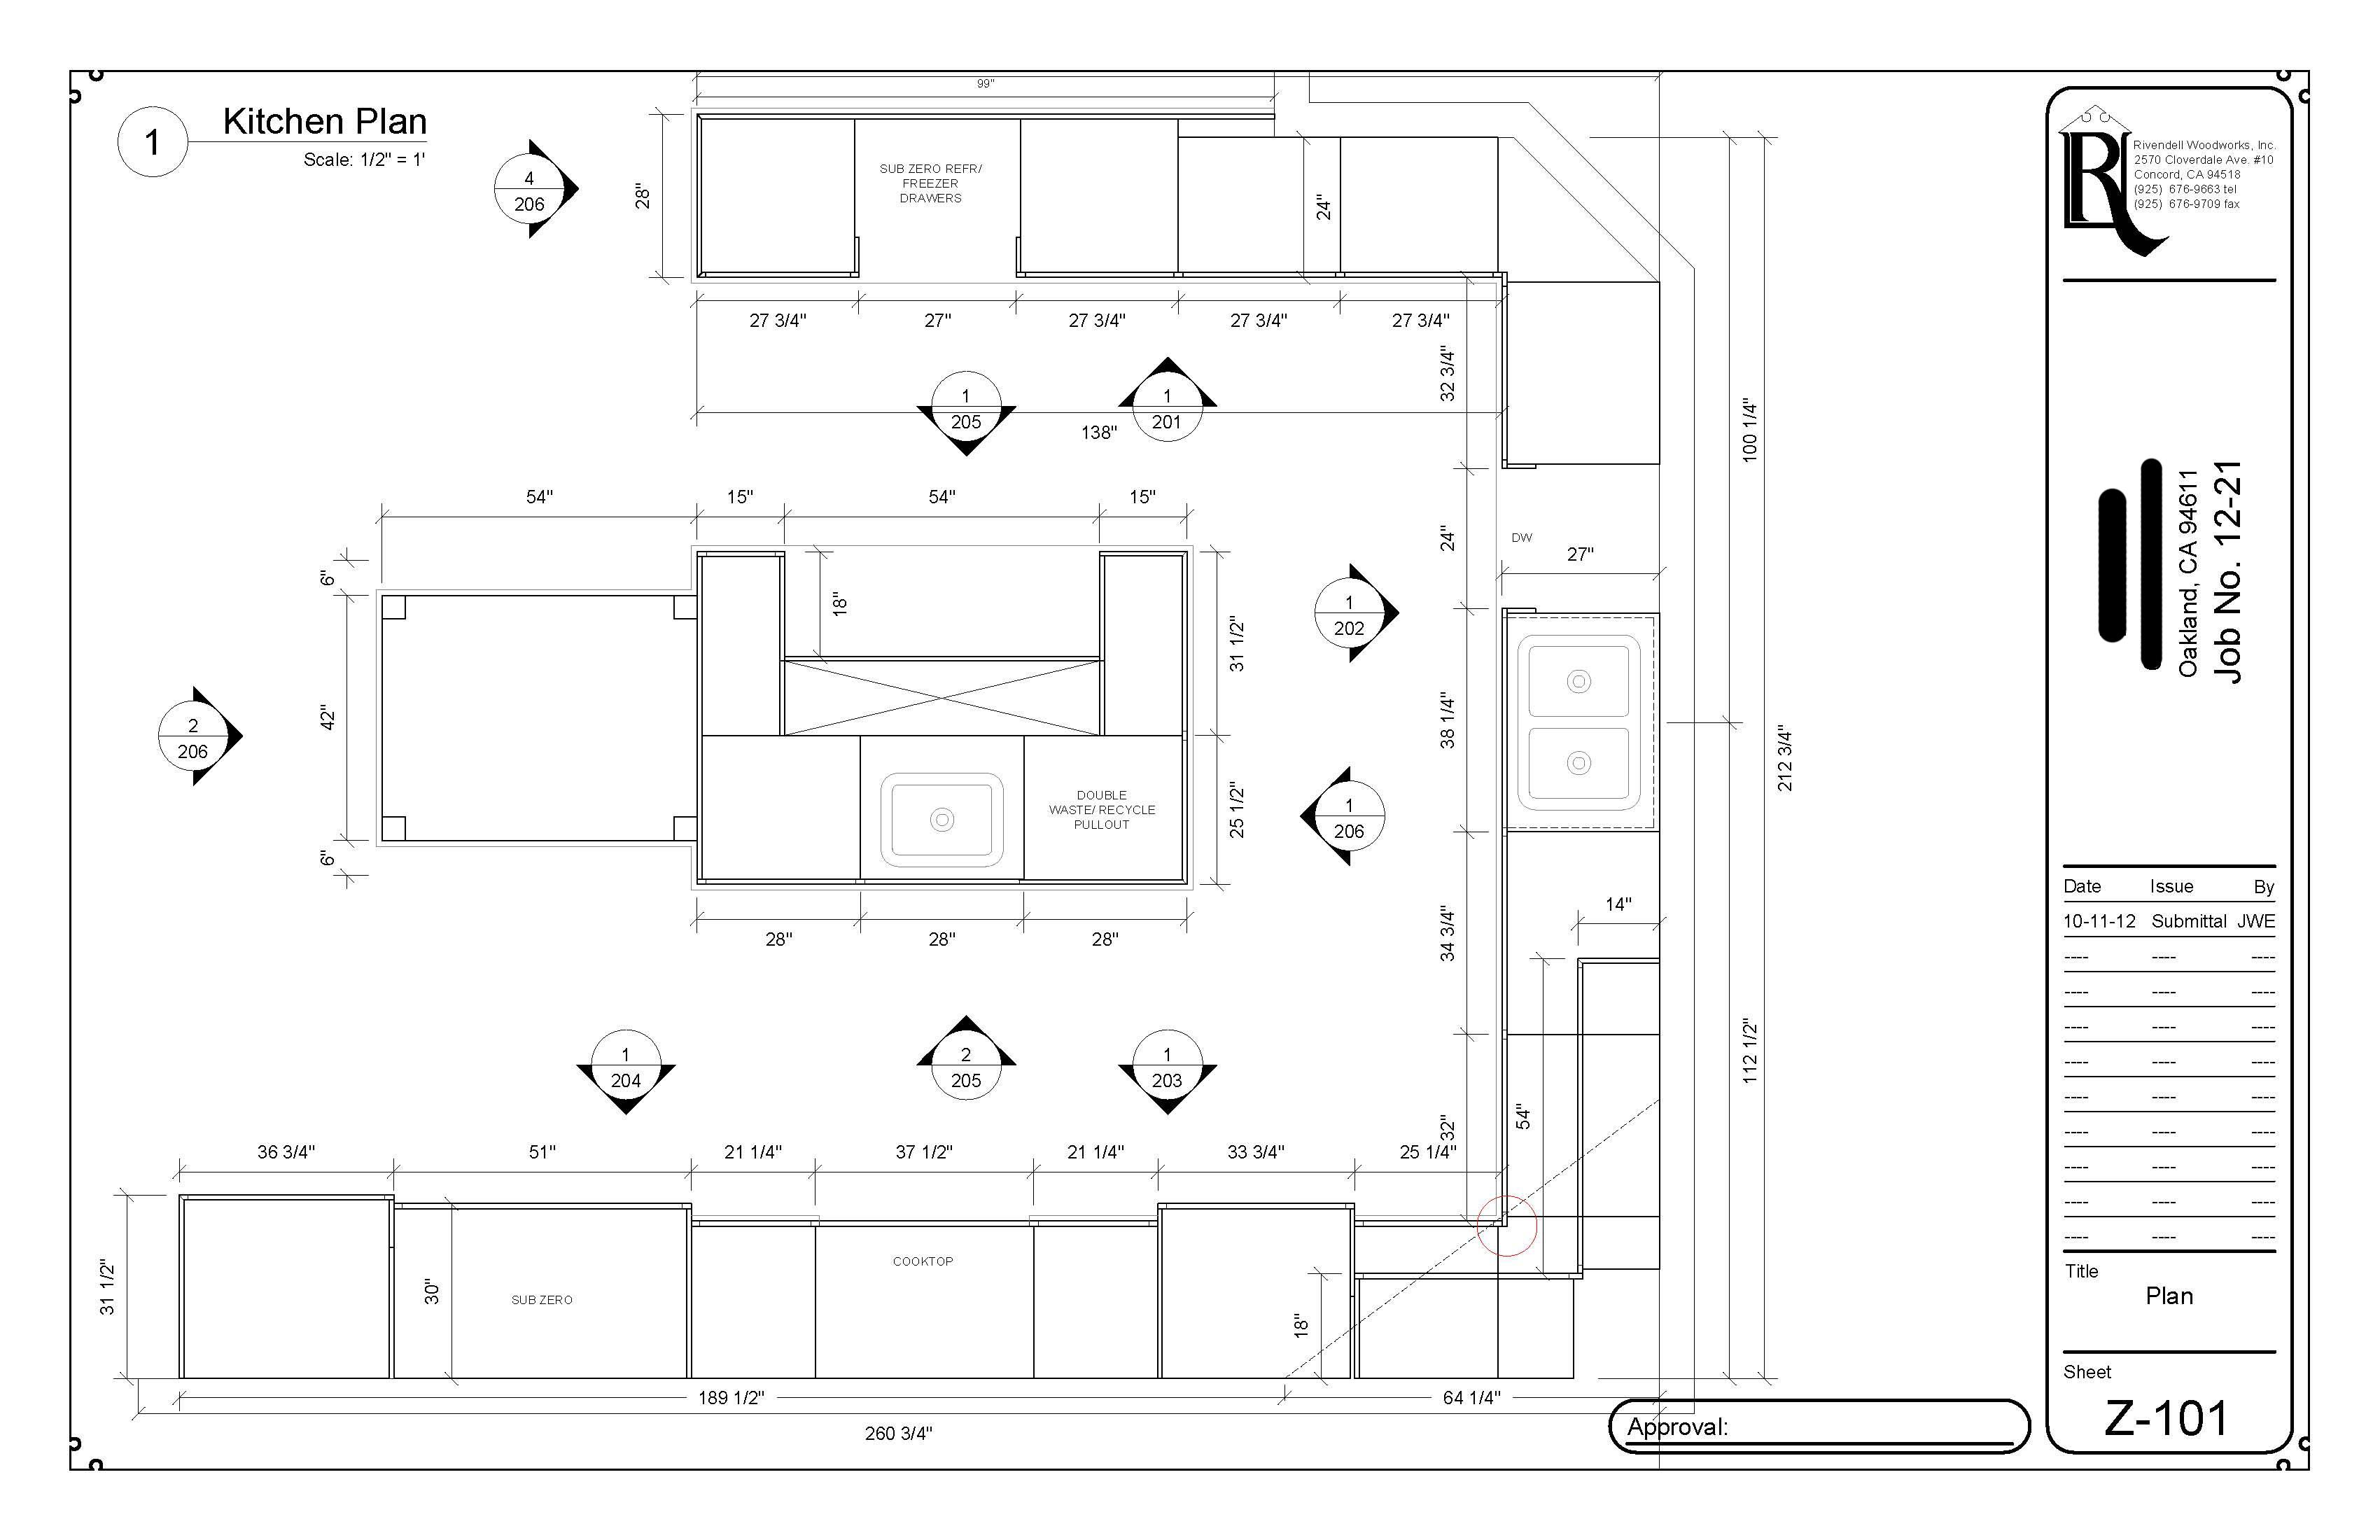 17 Surprisingly Kitchen Plan View  House Plans